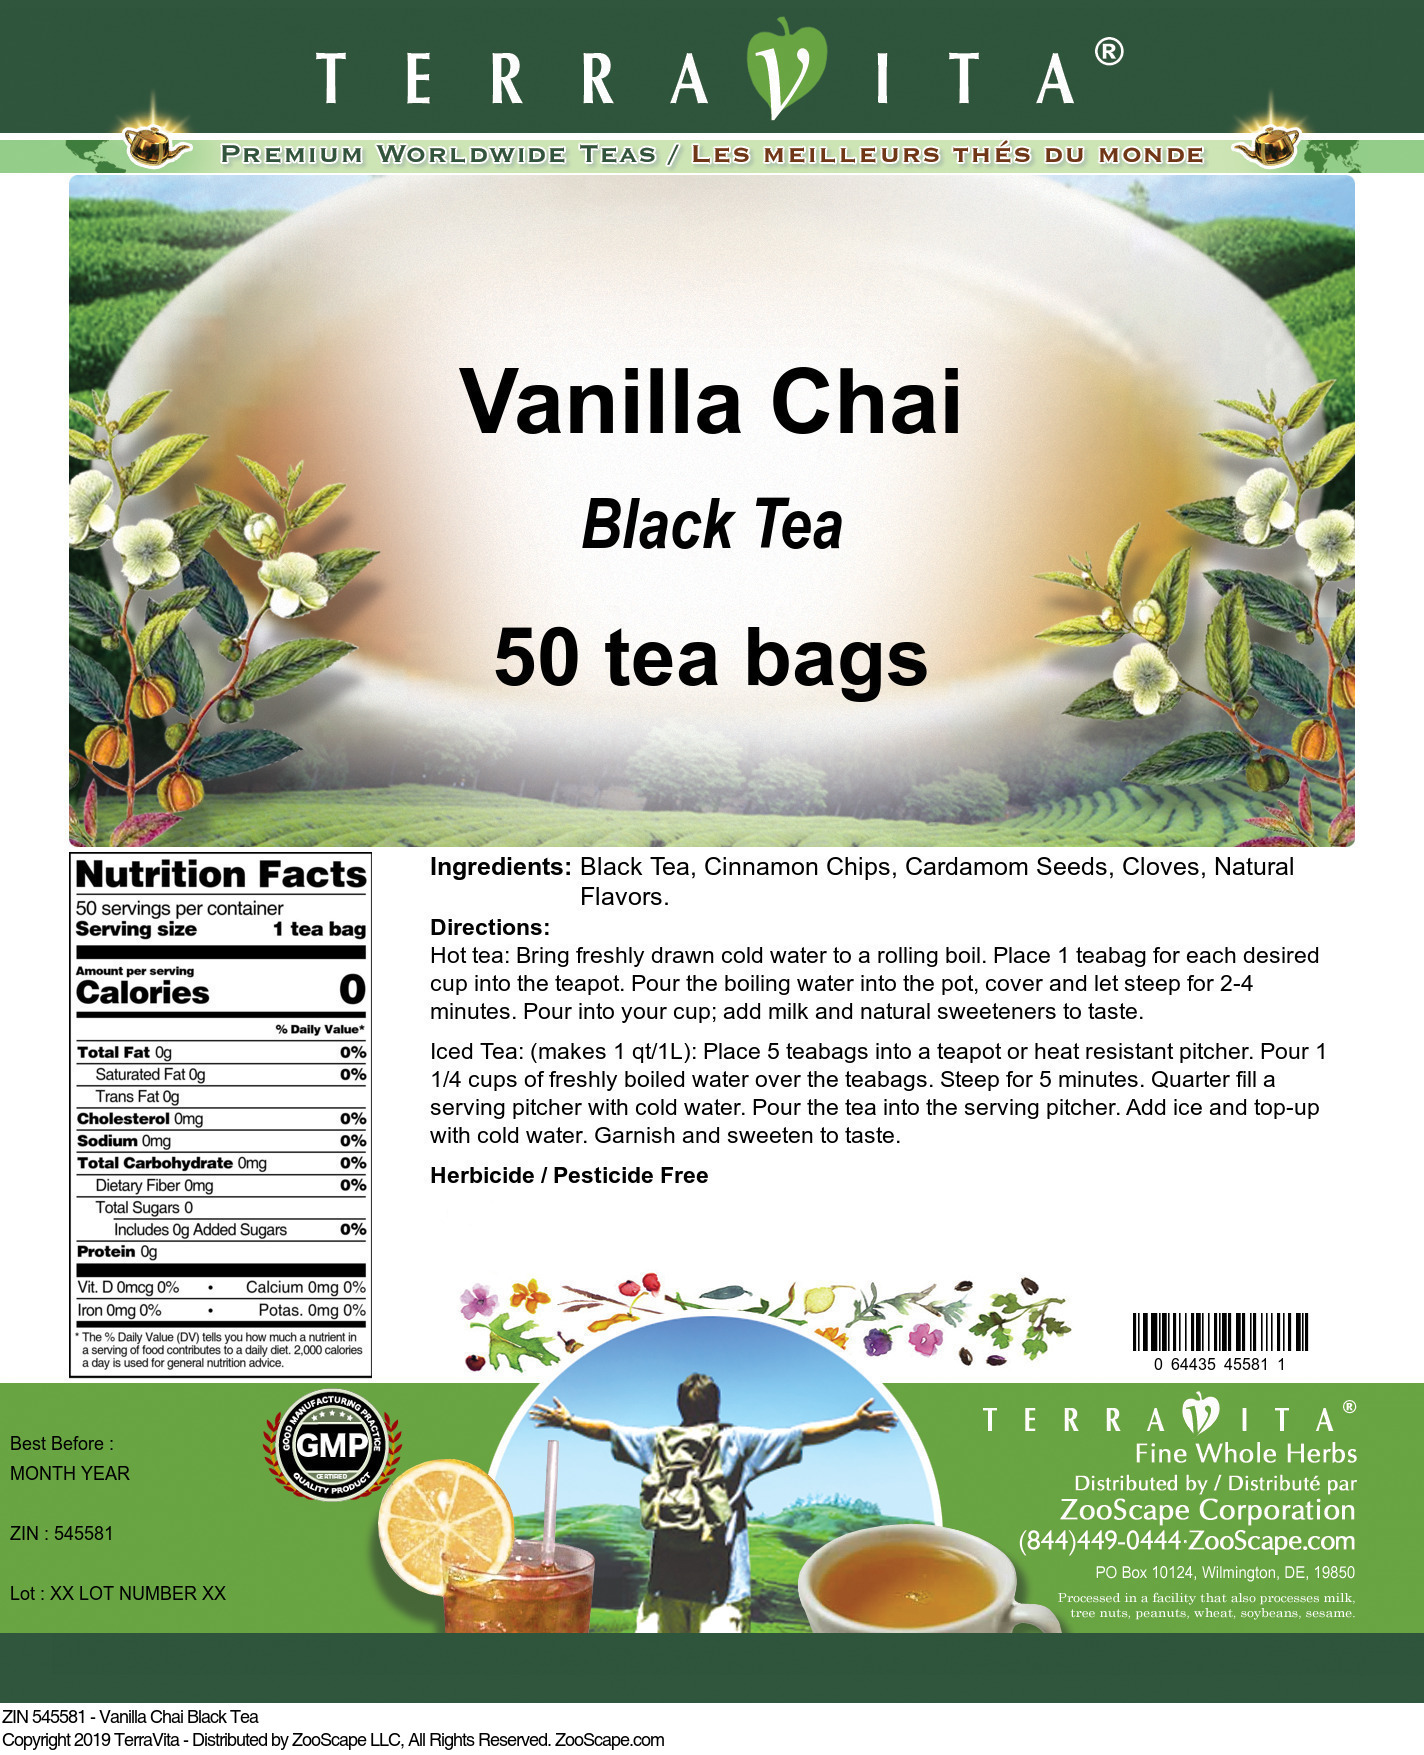 Vanilla Chai Black Tea